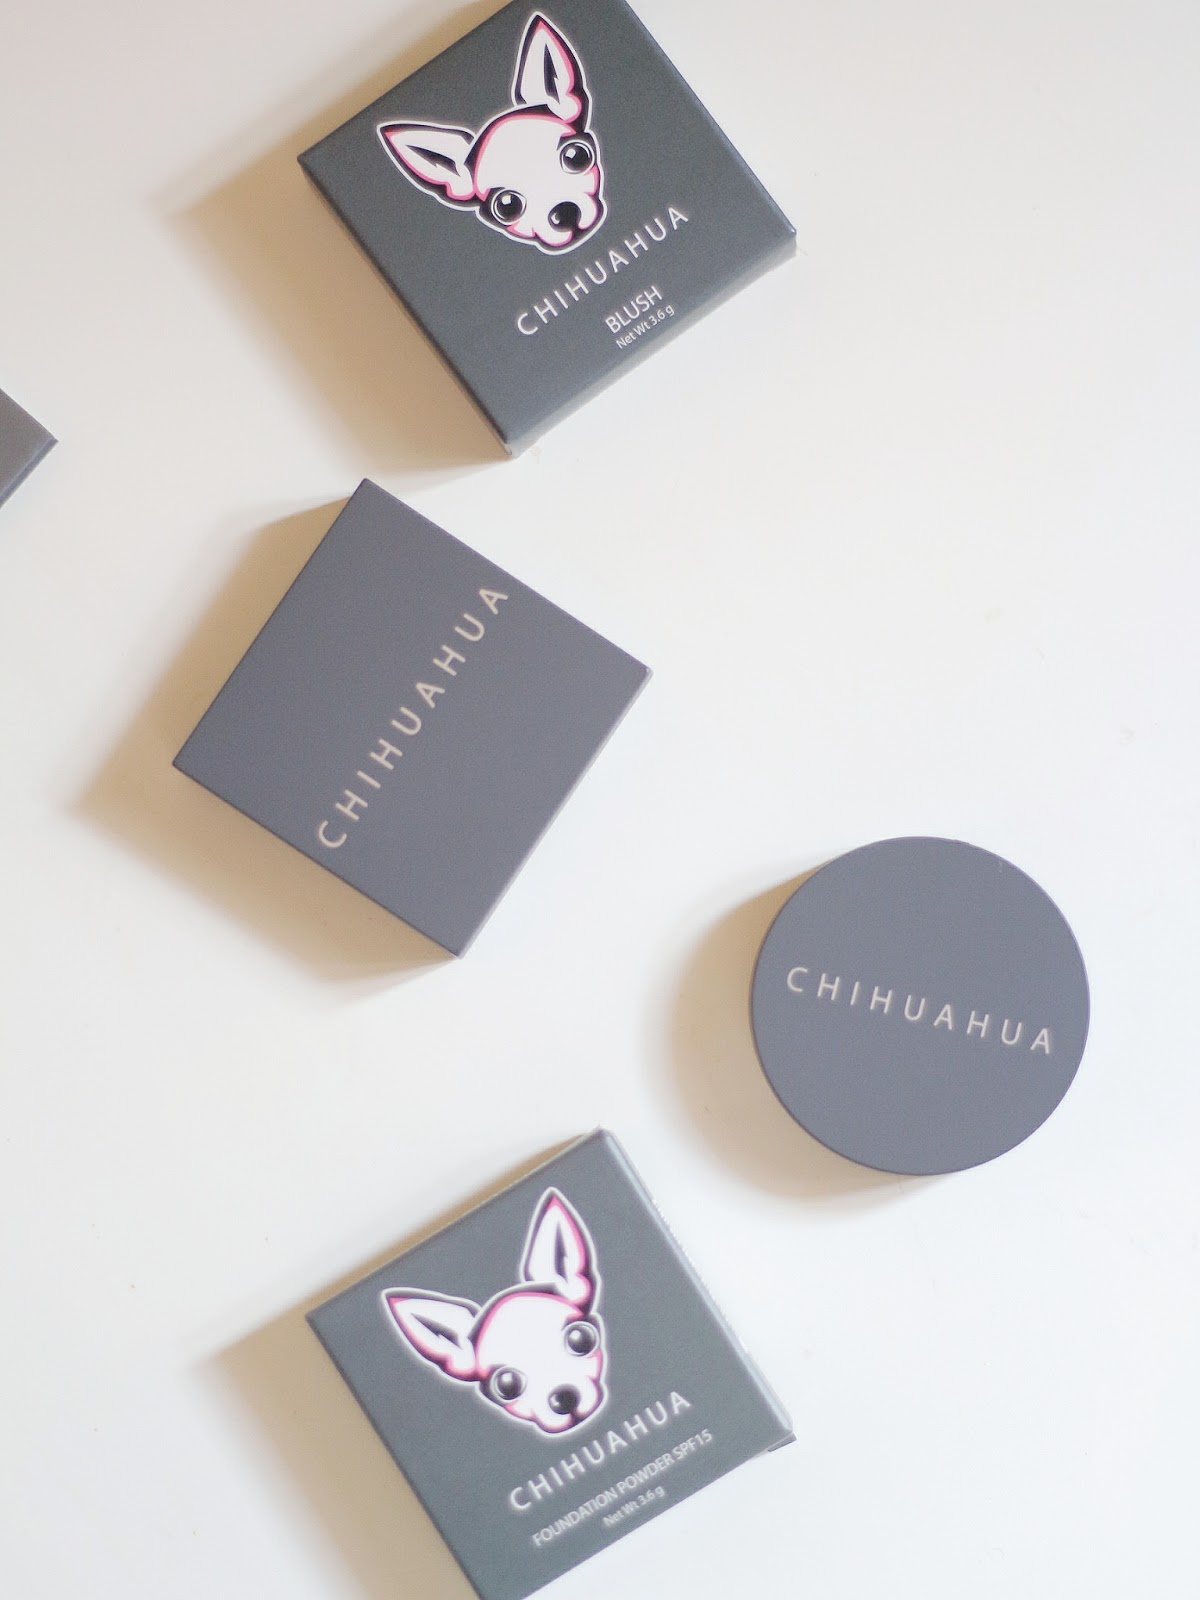 Chihuahua Cosmetics Review